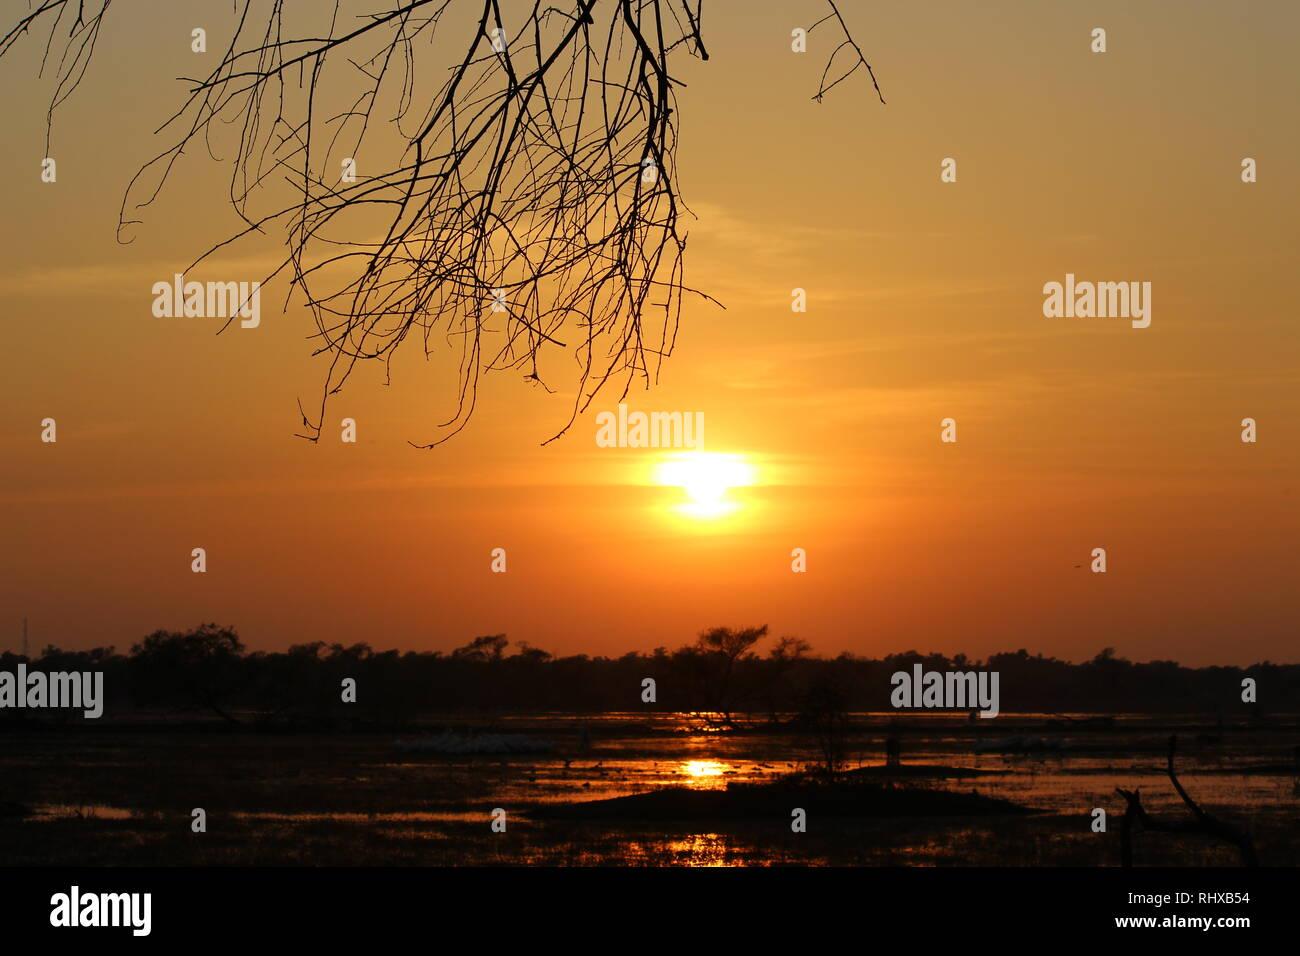 Reflection of Sun/Sunset In Bharatpur Bird Sanctuary/Keoladeo National Park - Stock Image